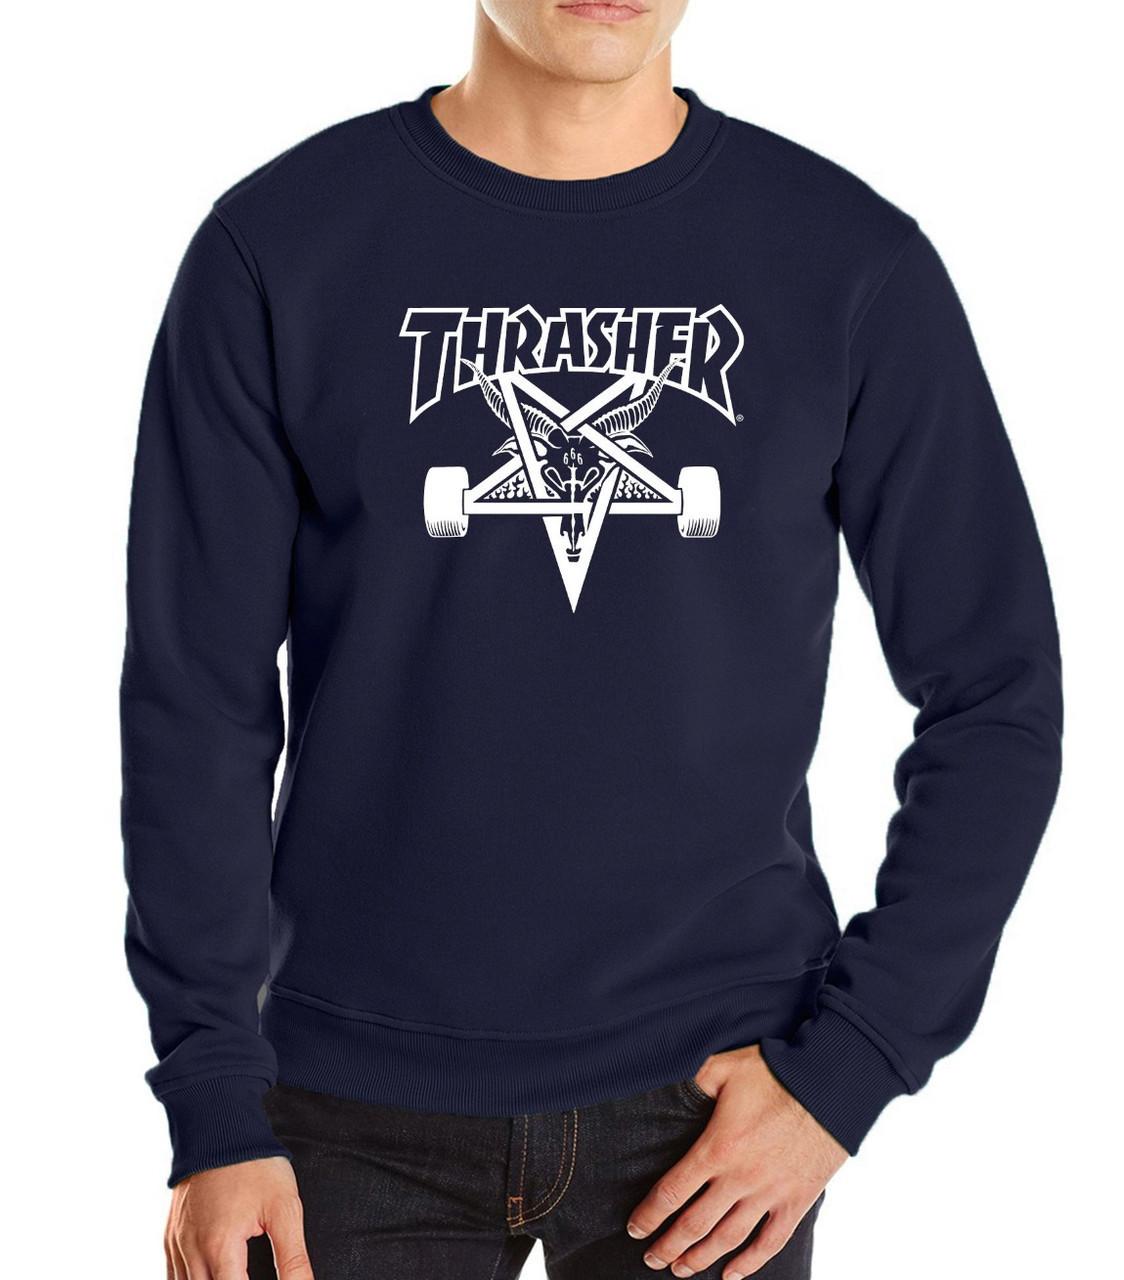 Свитшот синий Thrasher с белым принтом | Кофта синяя Thrasher